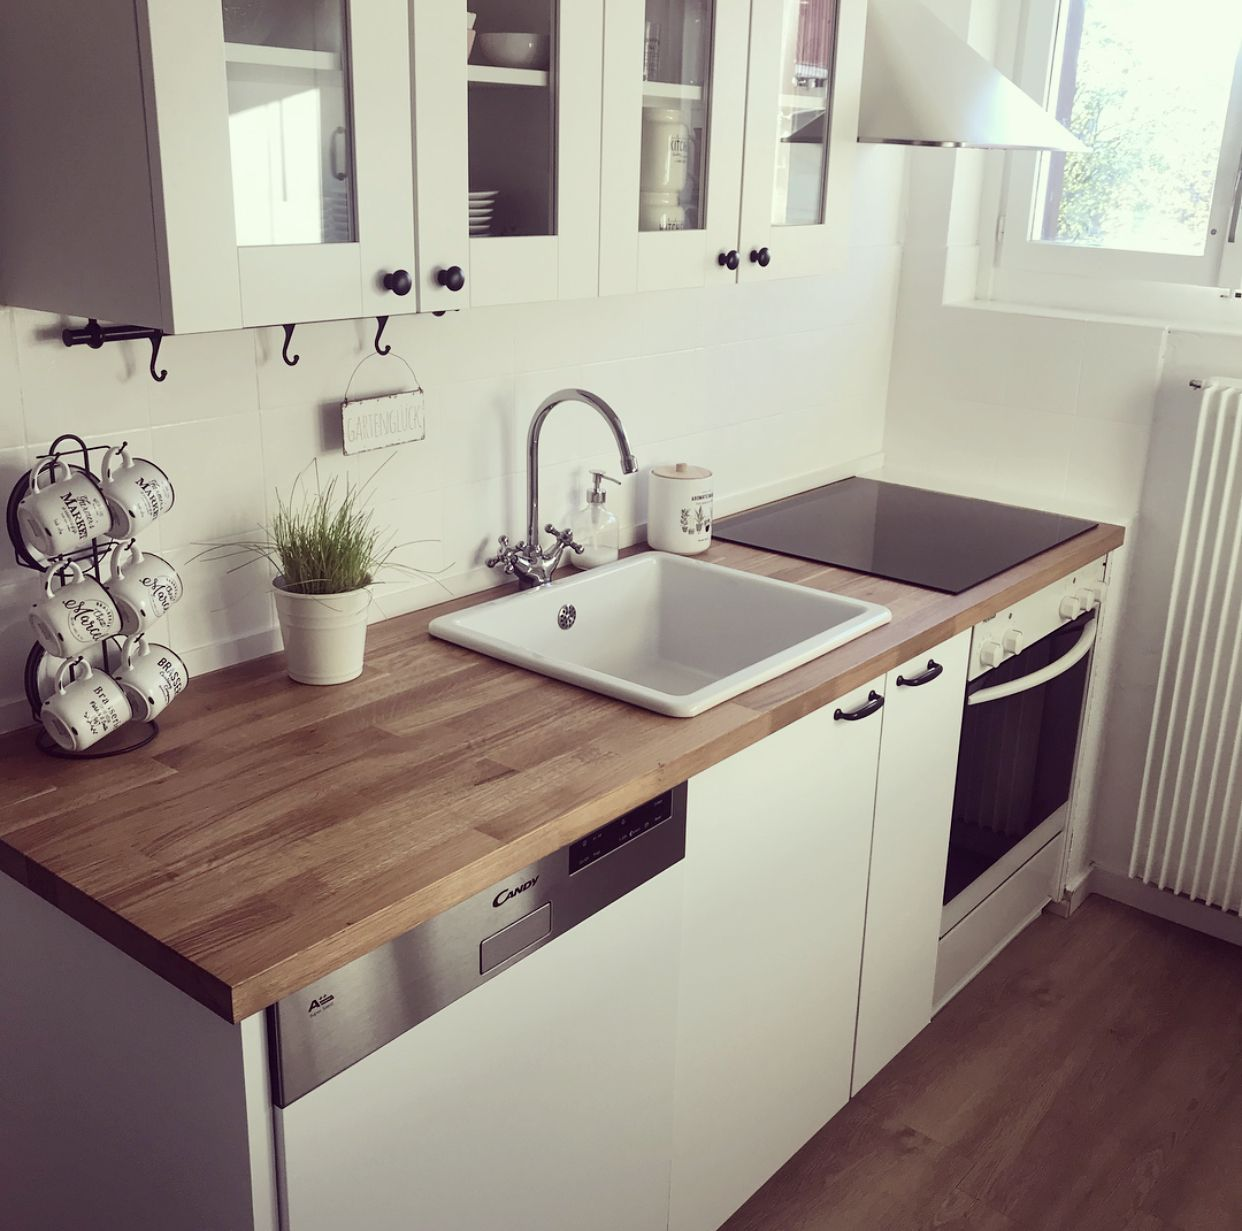 Ikea Kuechen Knoxhult   Home Decor